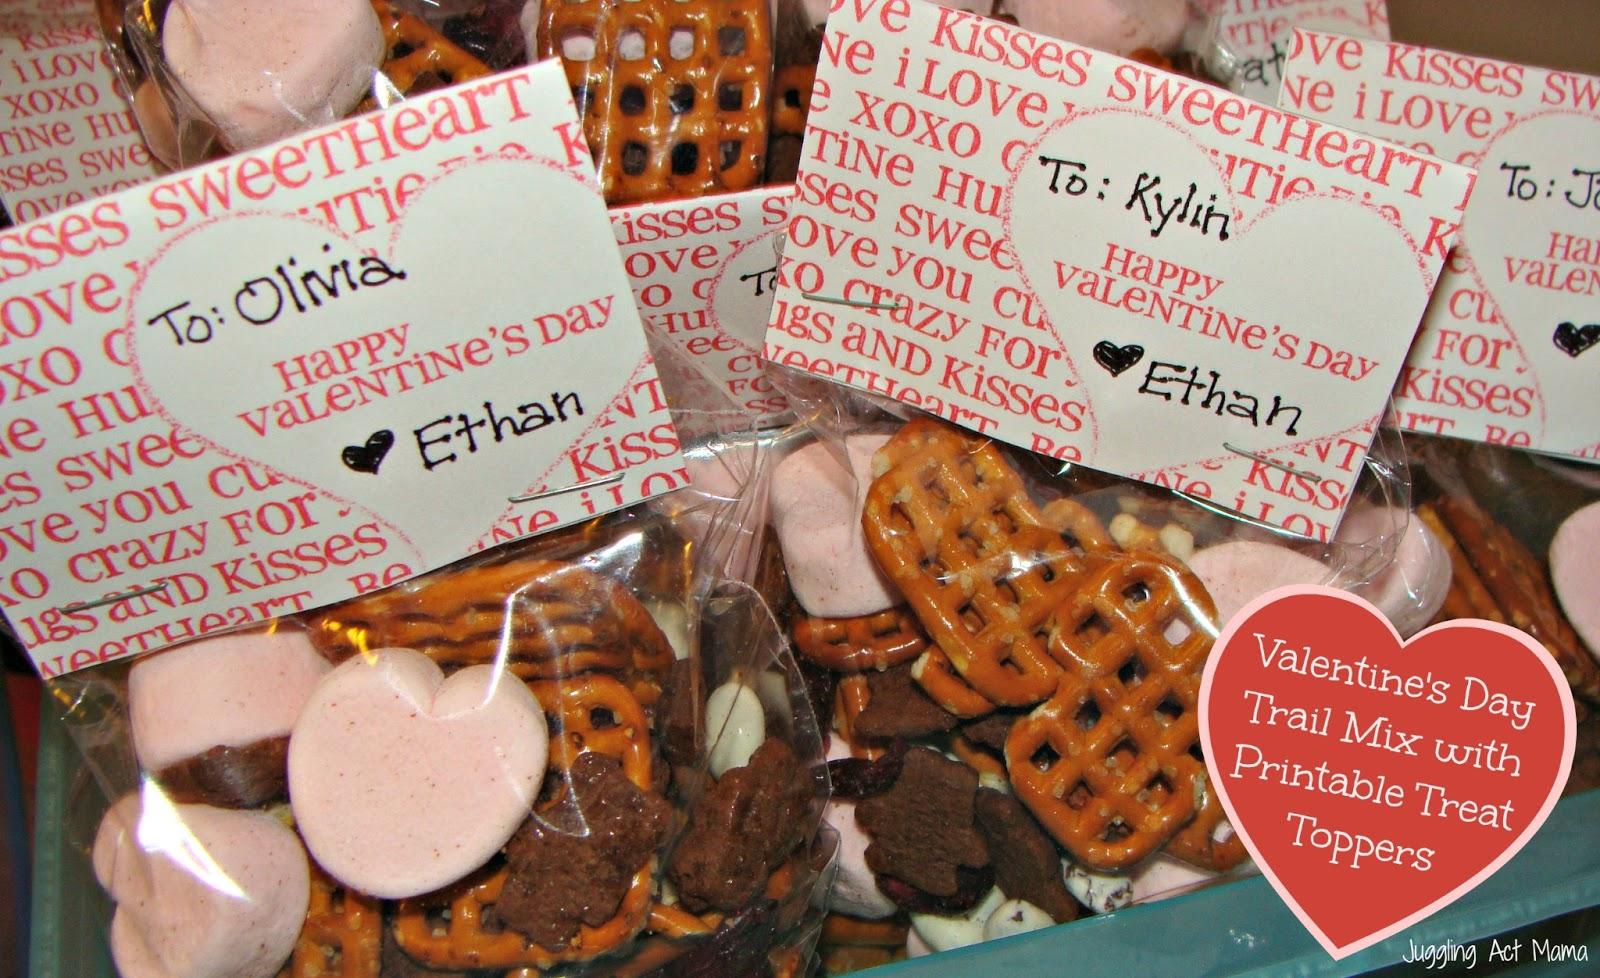 Valentineu0027s Day Trail Mix U0026 Treat Bag Toppers